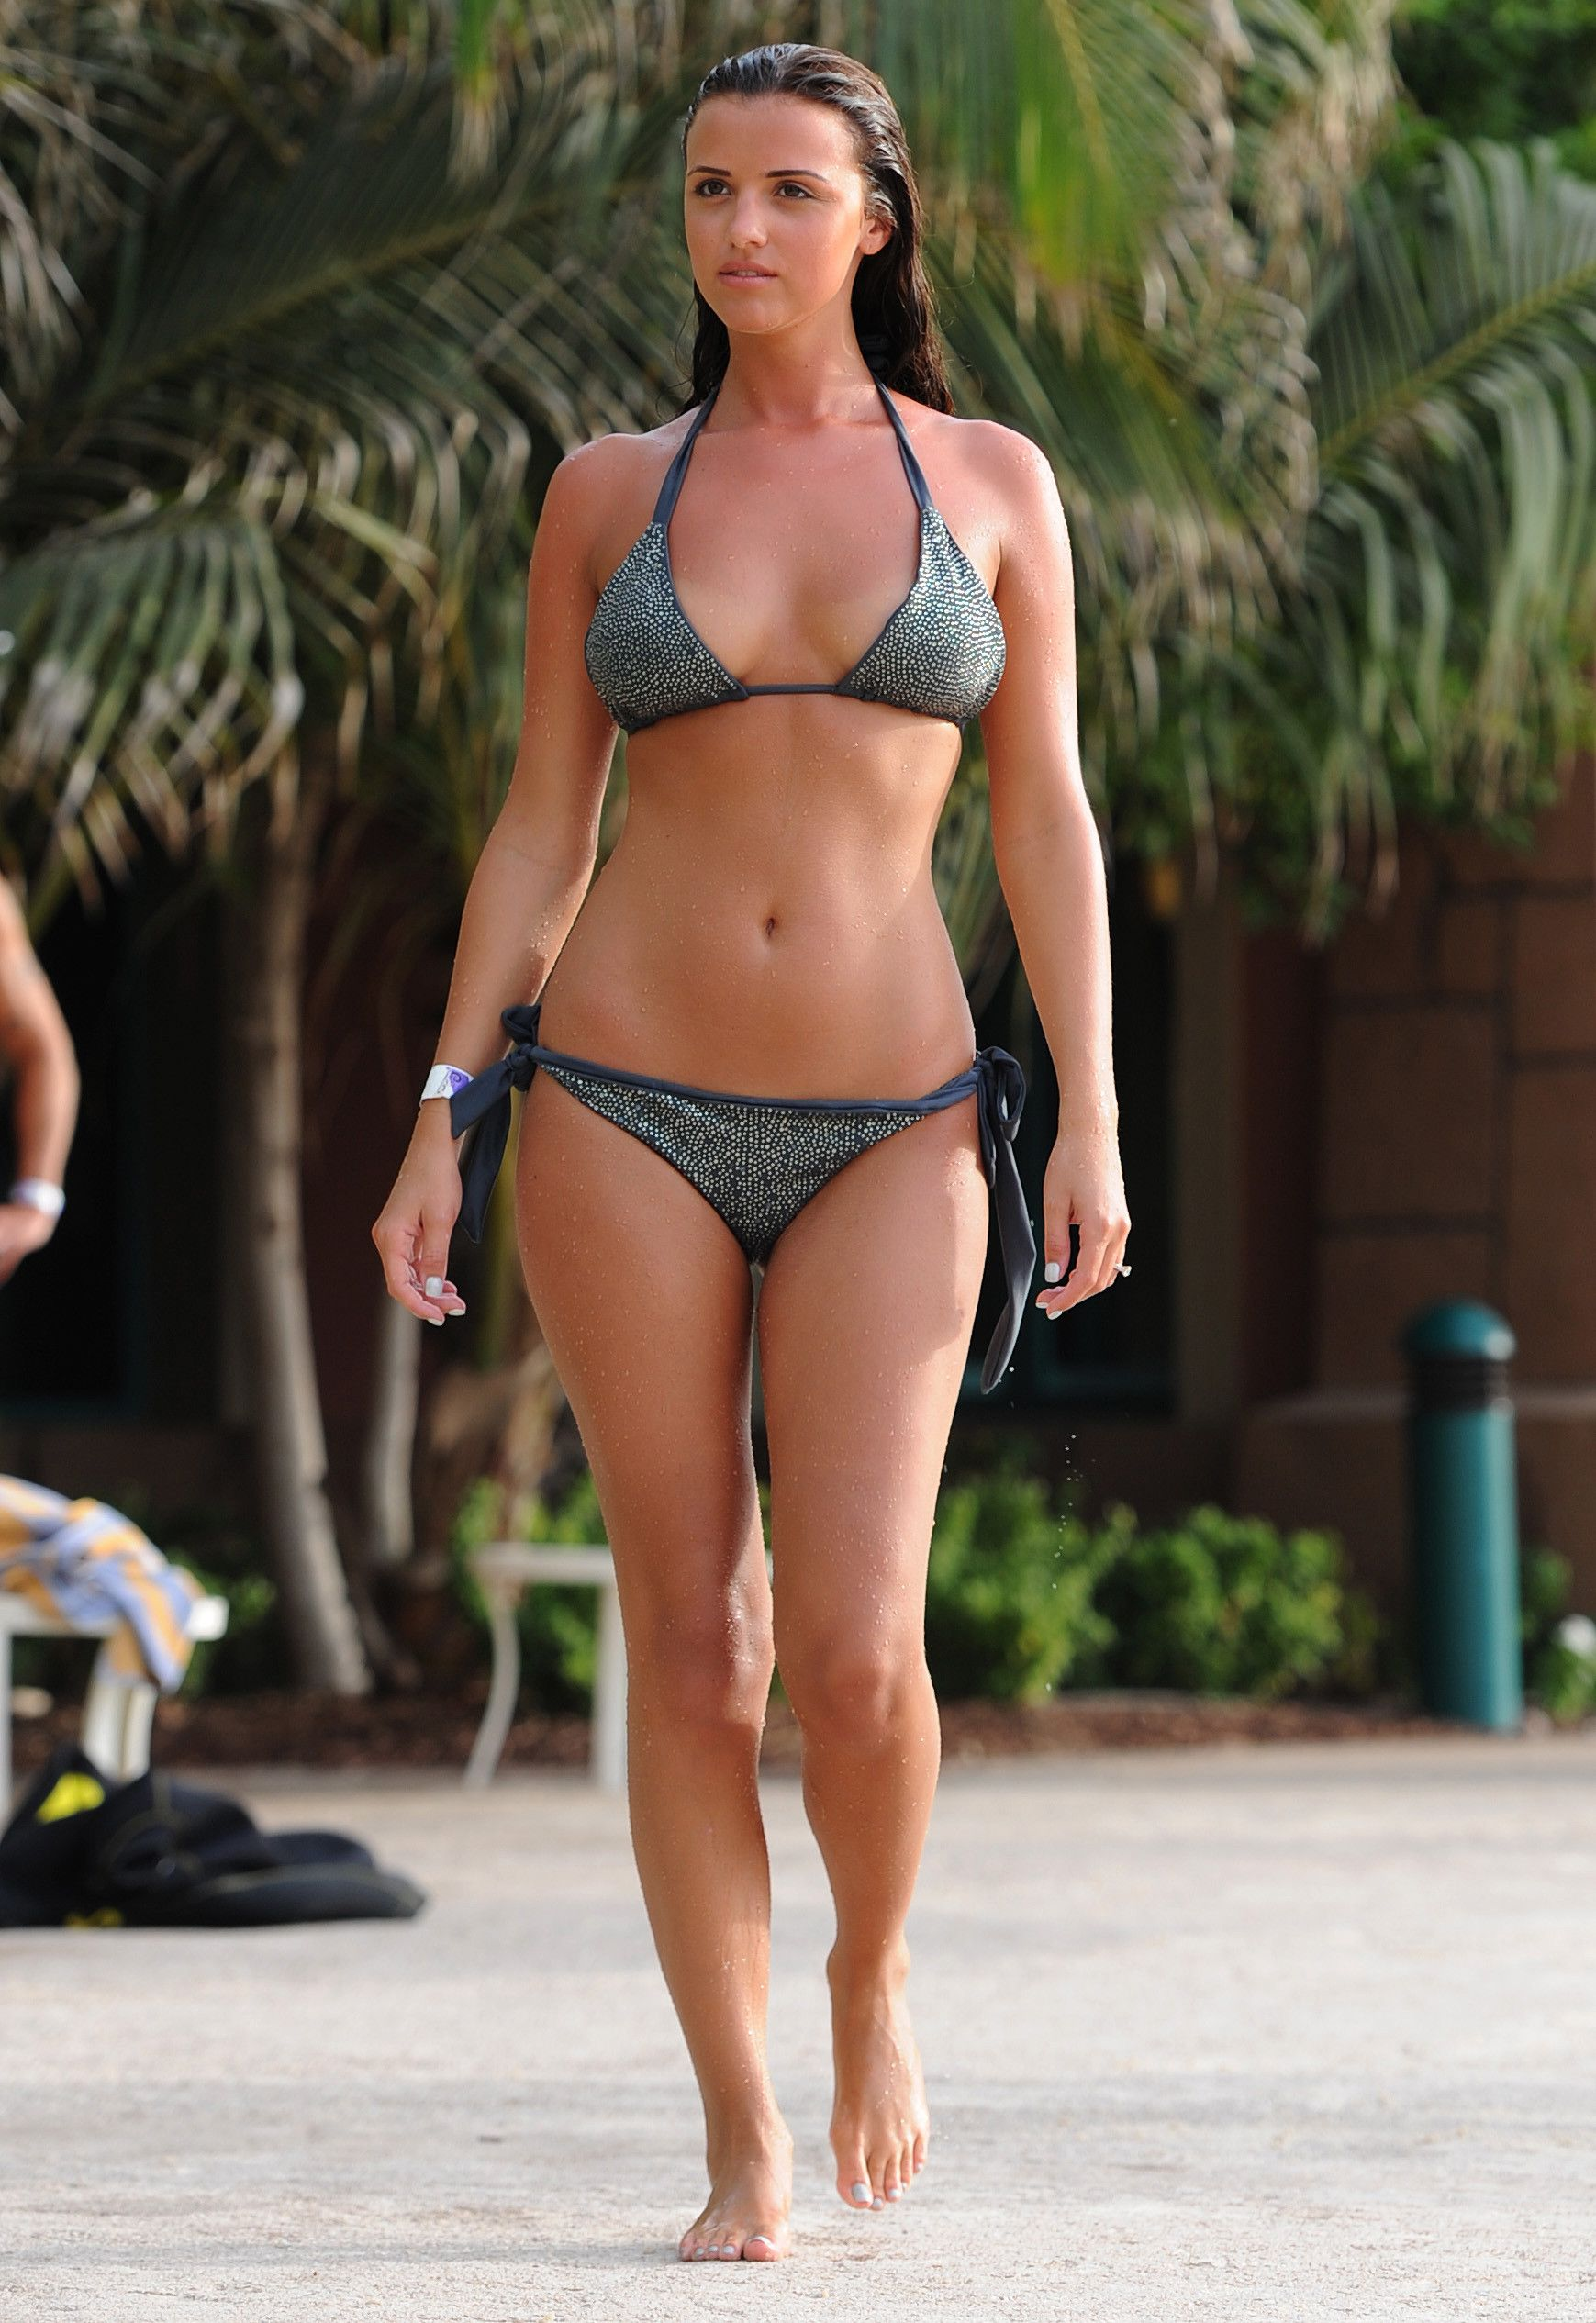 Explore Bikini Models, Bikini Babes, and more!